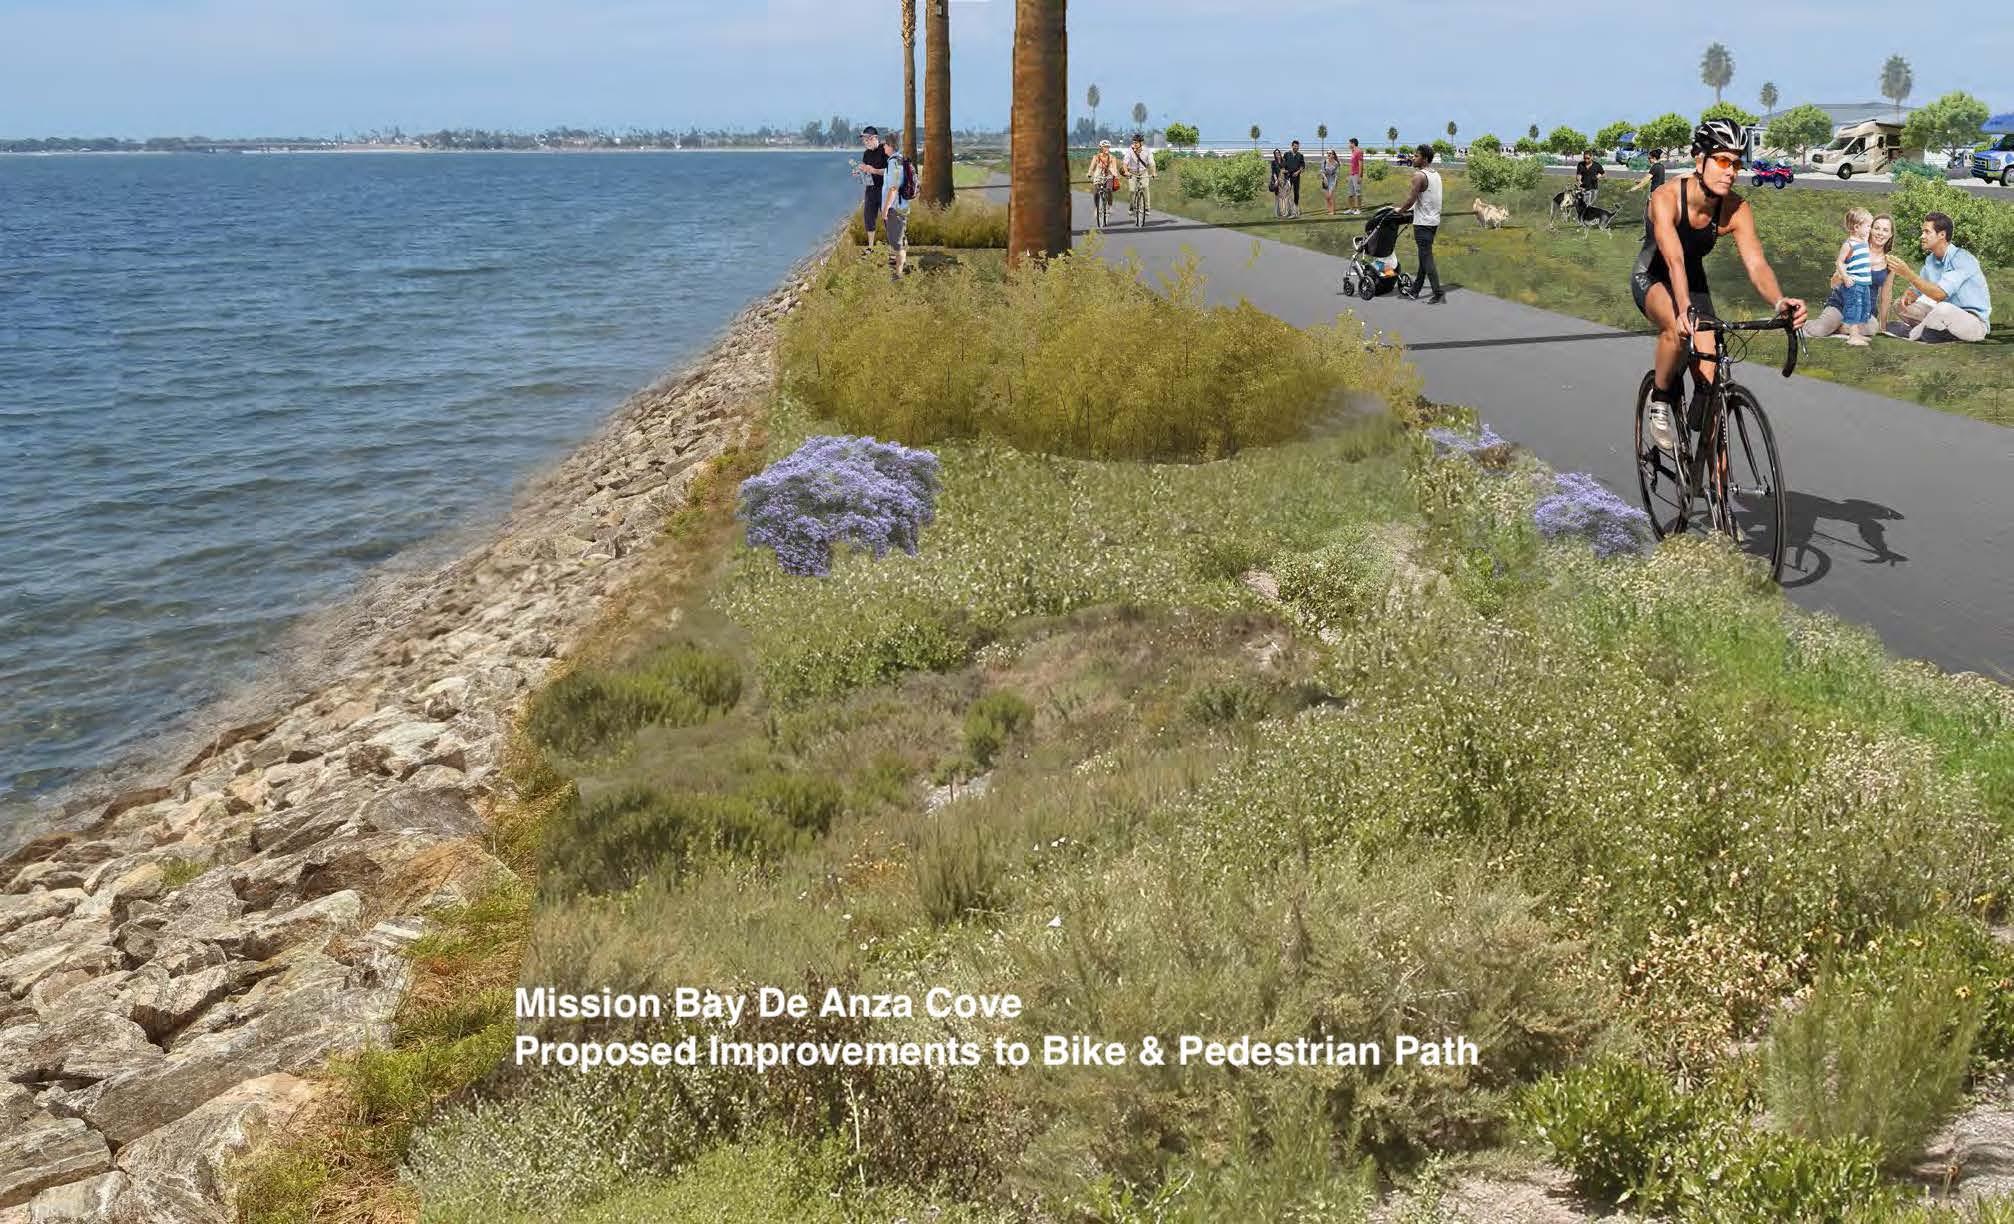 De Anza Cove bike path improvements